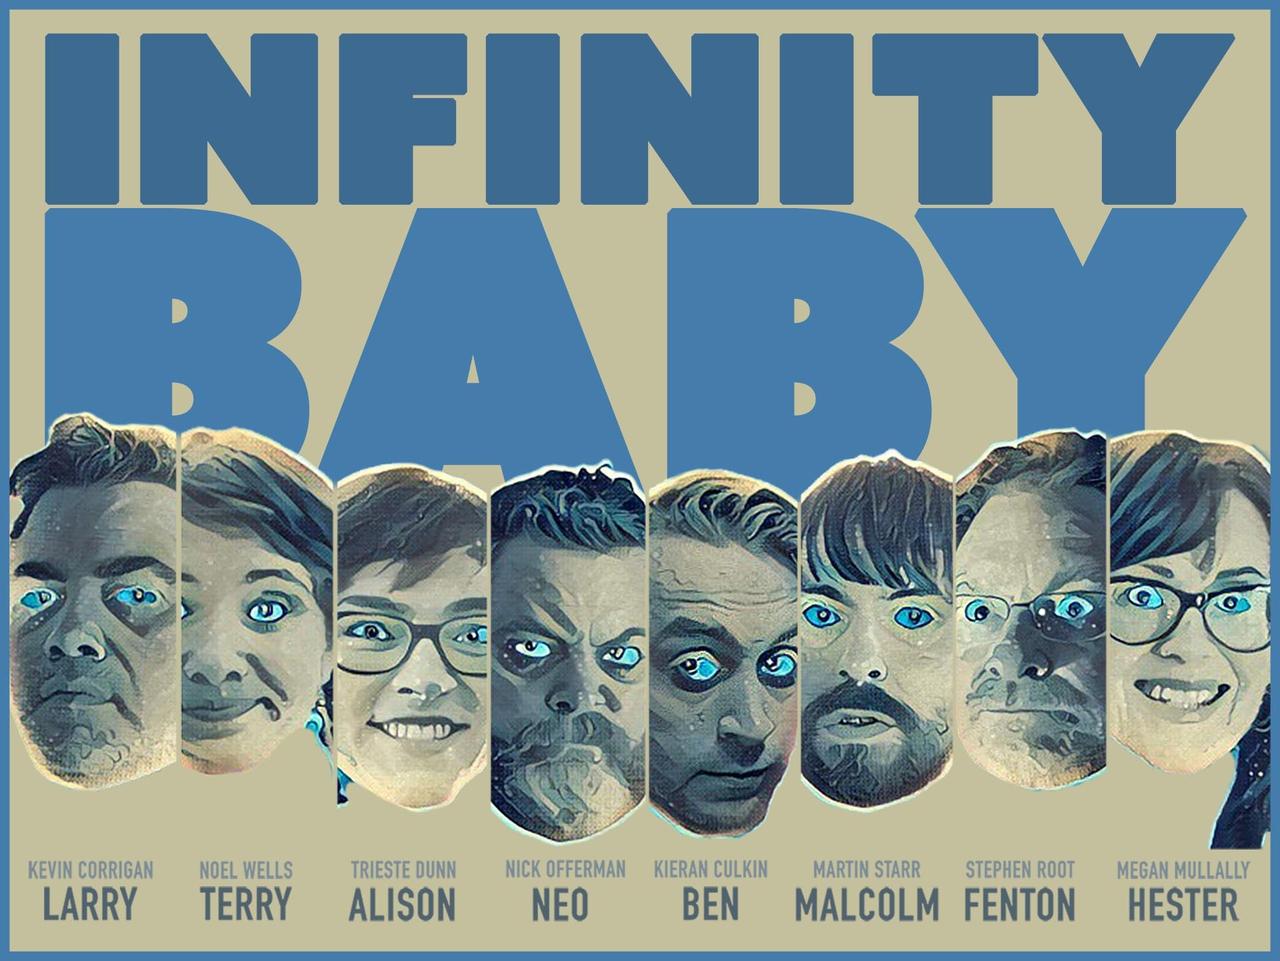 Trieste Kelly Dunn در صحنه فیلم سینمایی Infinity Baby به همراه مگان مولالی، کوین کوریگان، استیون روت، Kieran Culkin، نیک آفرمن، مارتین استار و Noël Wells